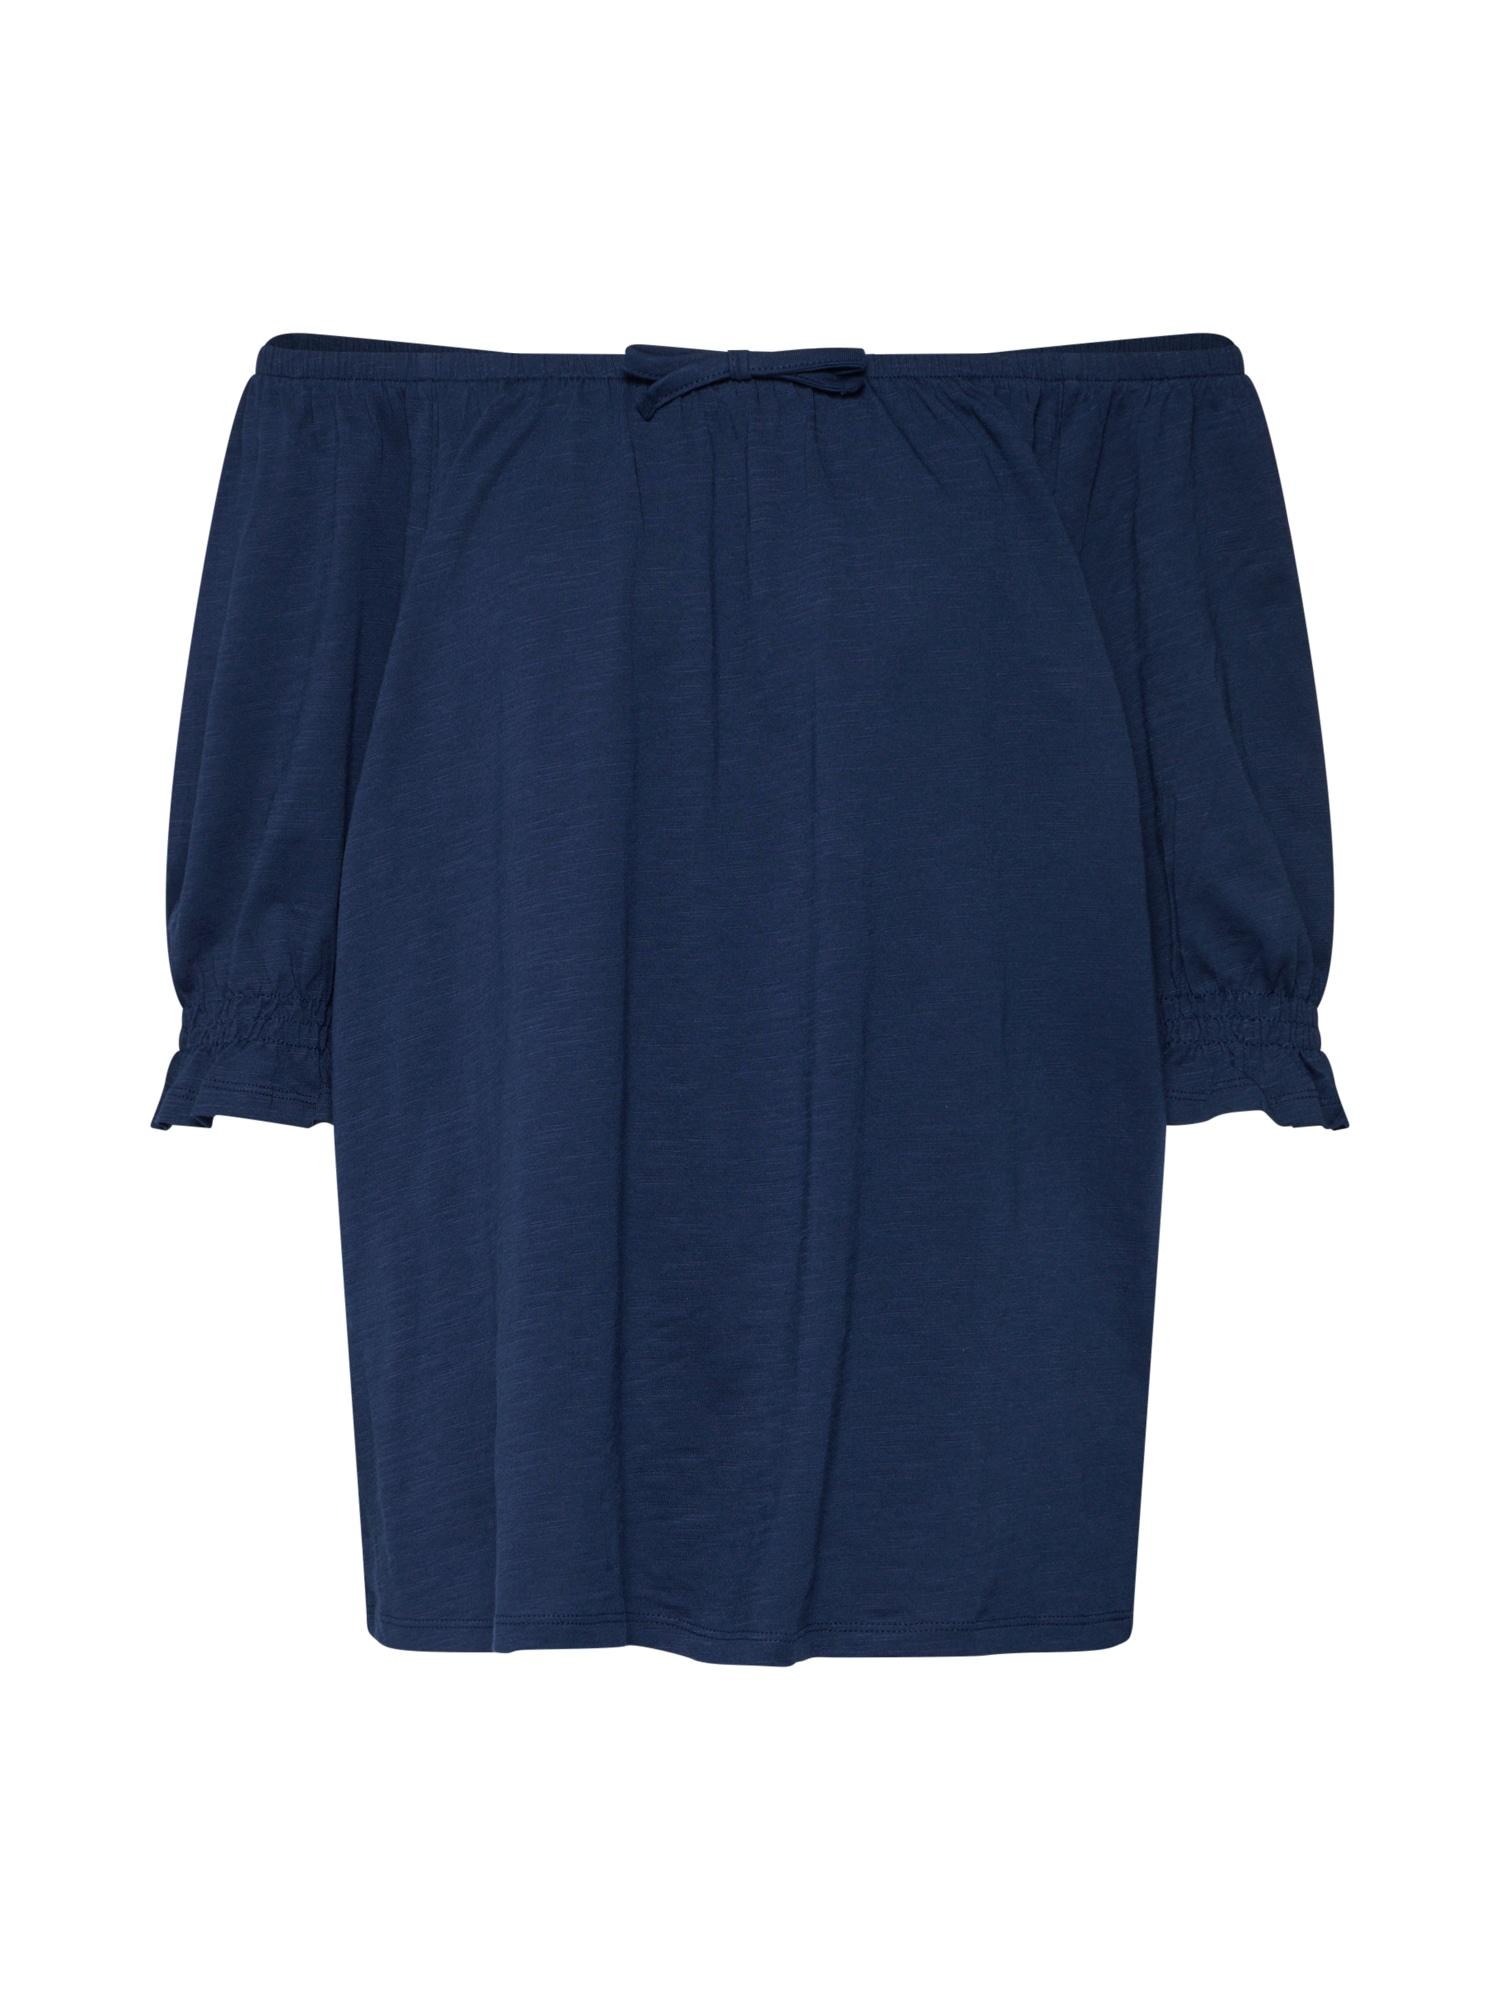 Tričko OCS Carmen T námořnická modř ESPRIT